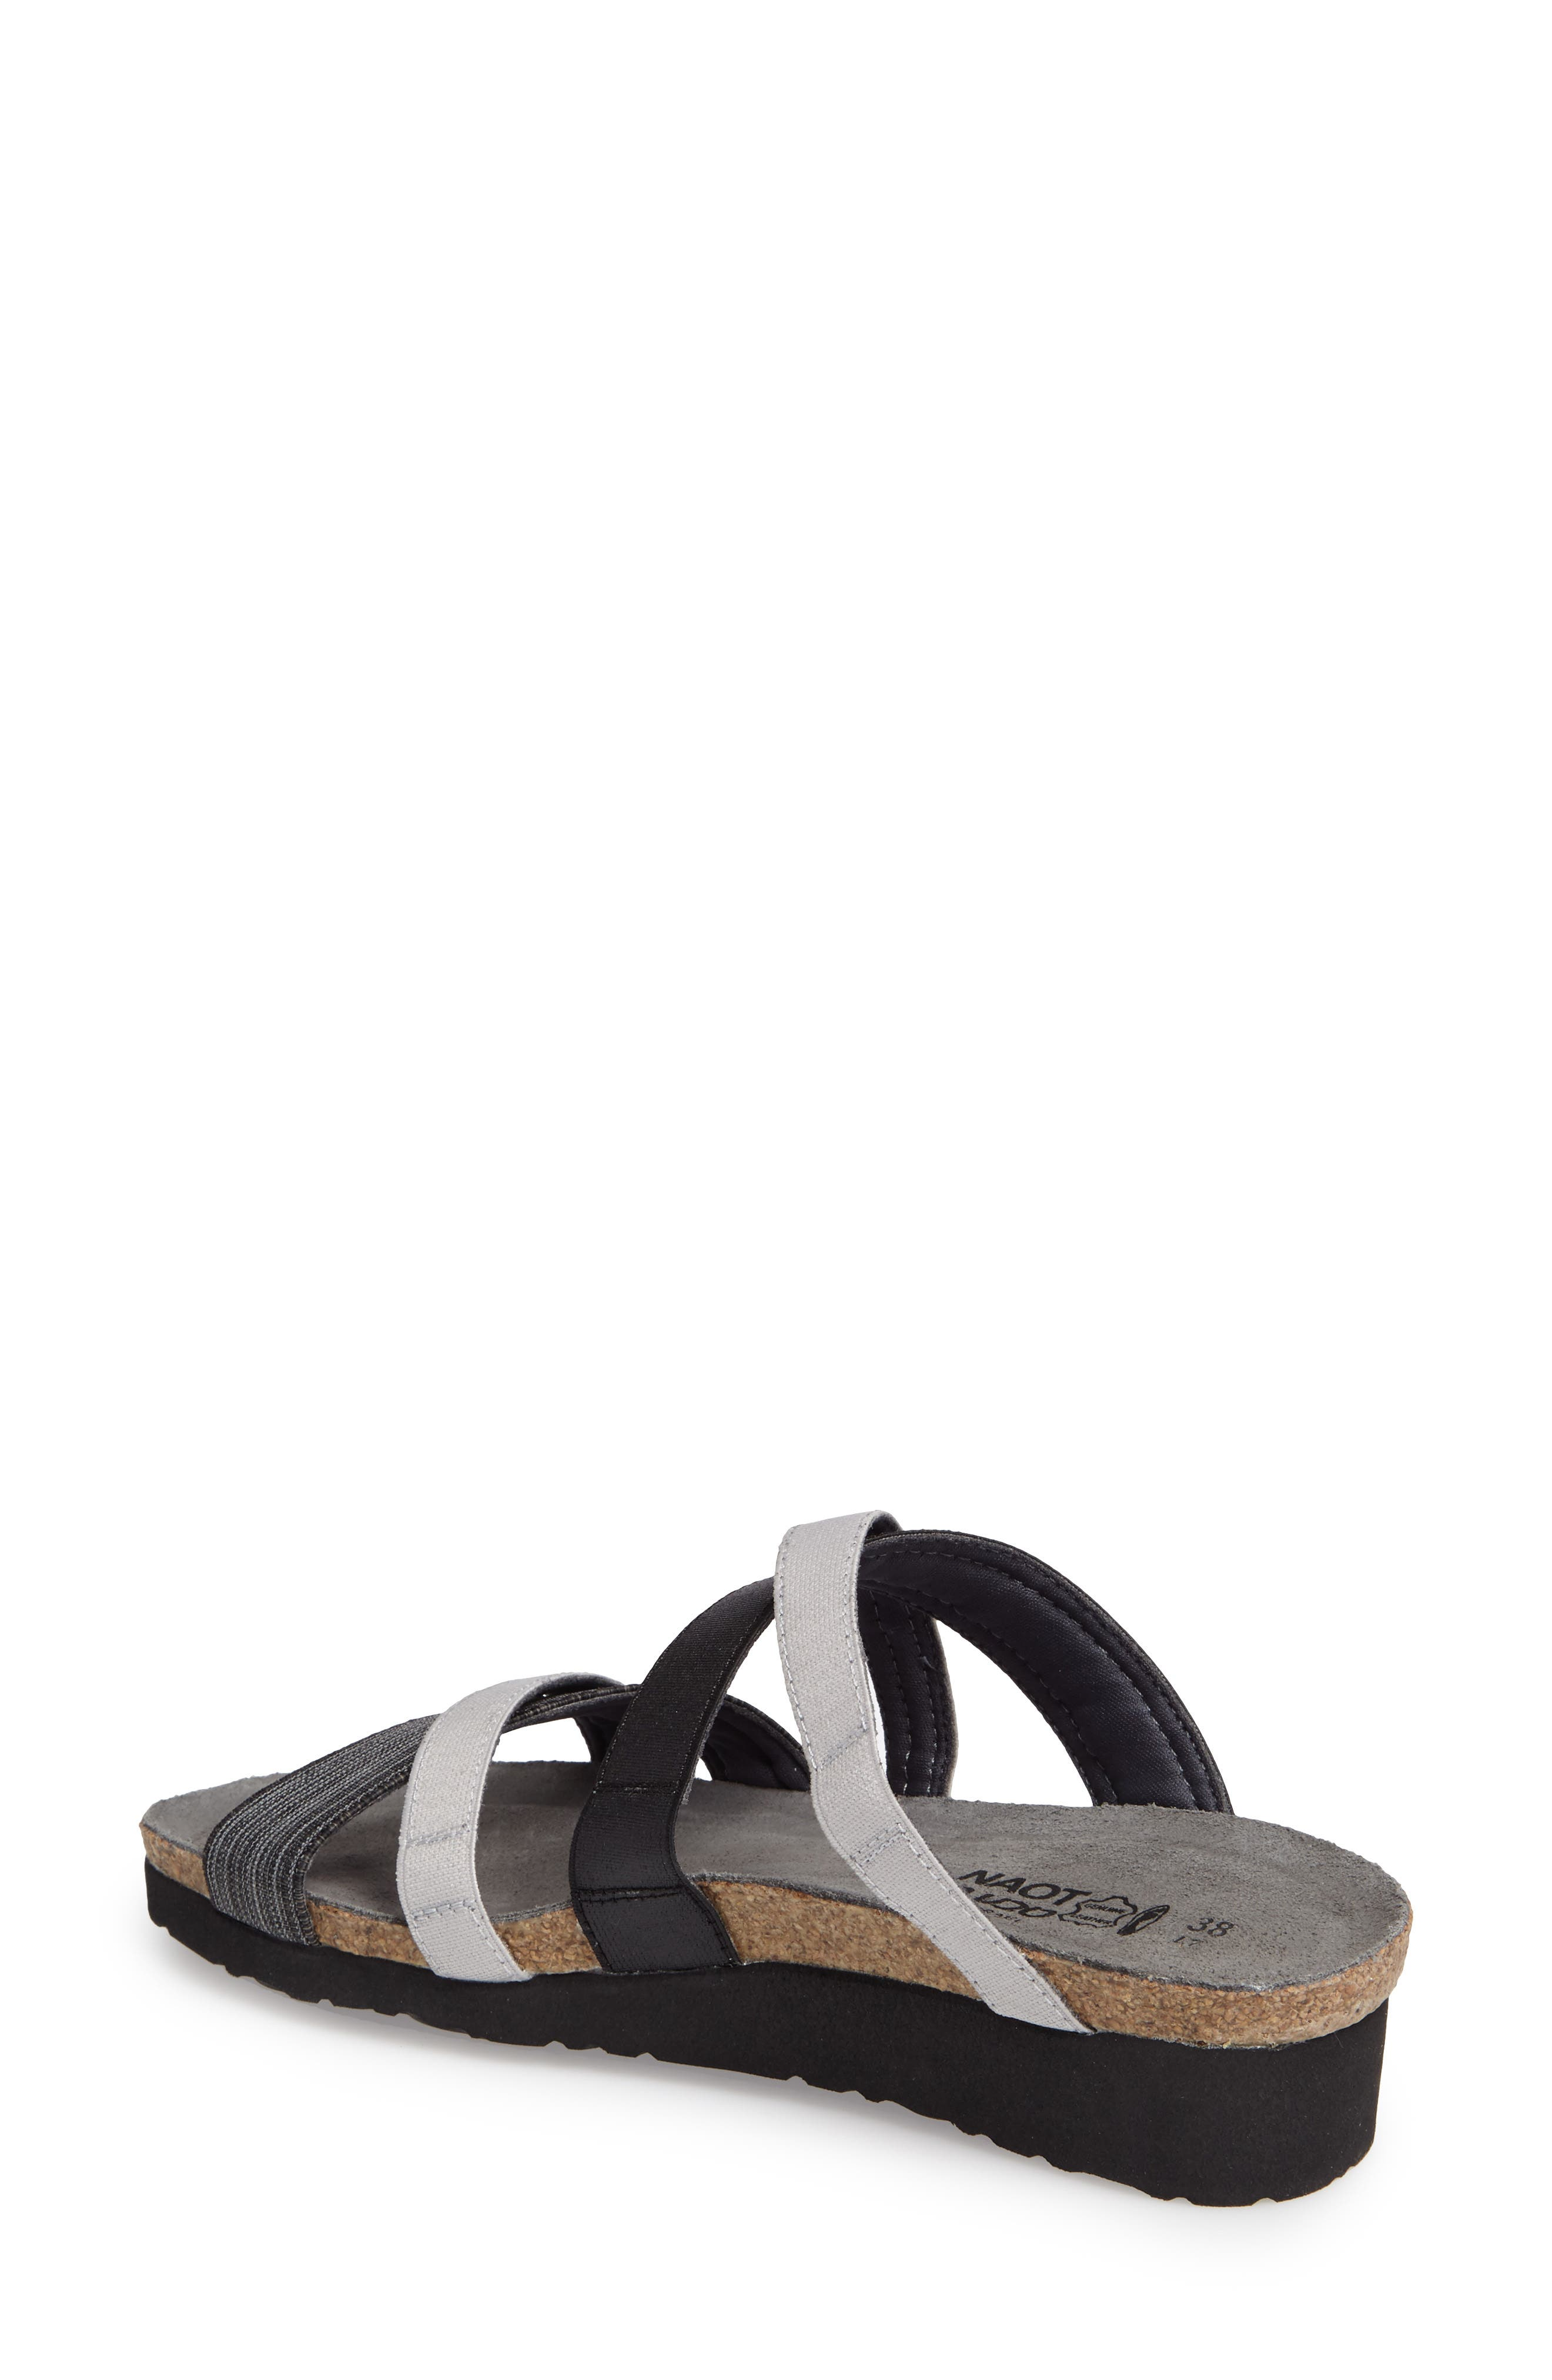 Roxana Strappy Slip-On Sandal,                             Alternate thumbnail 2, color,                             BLACK/ GREY FABRIC